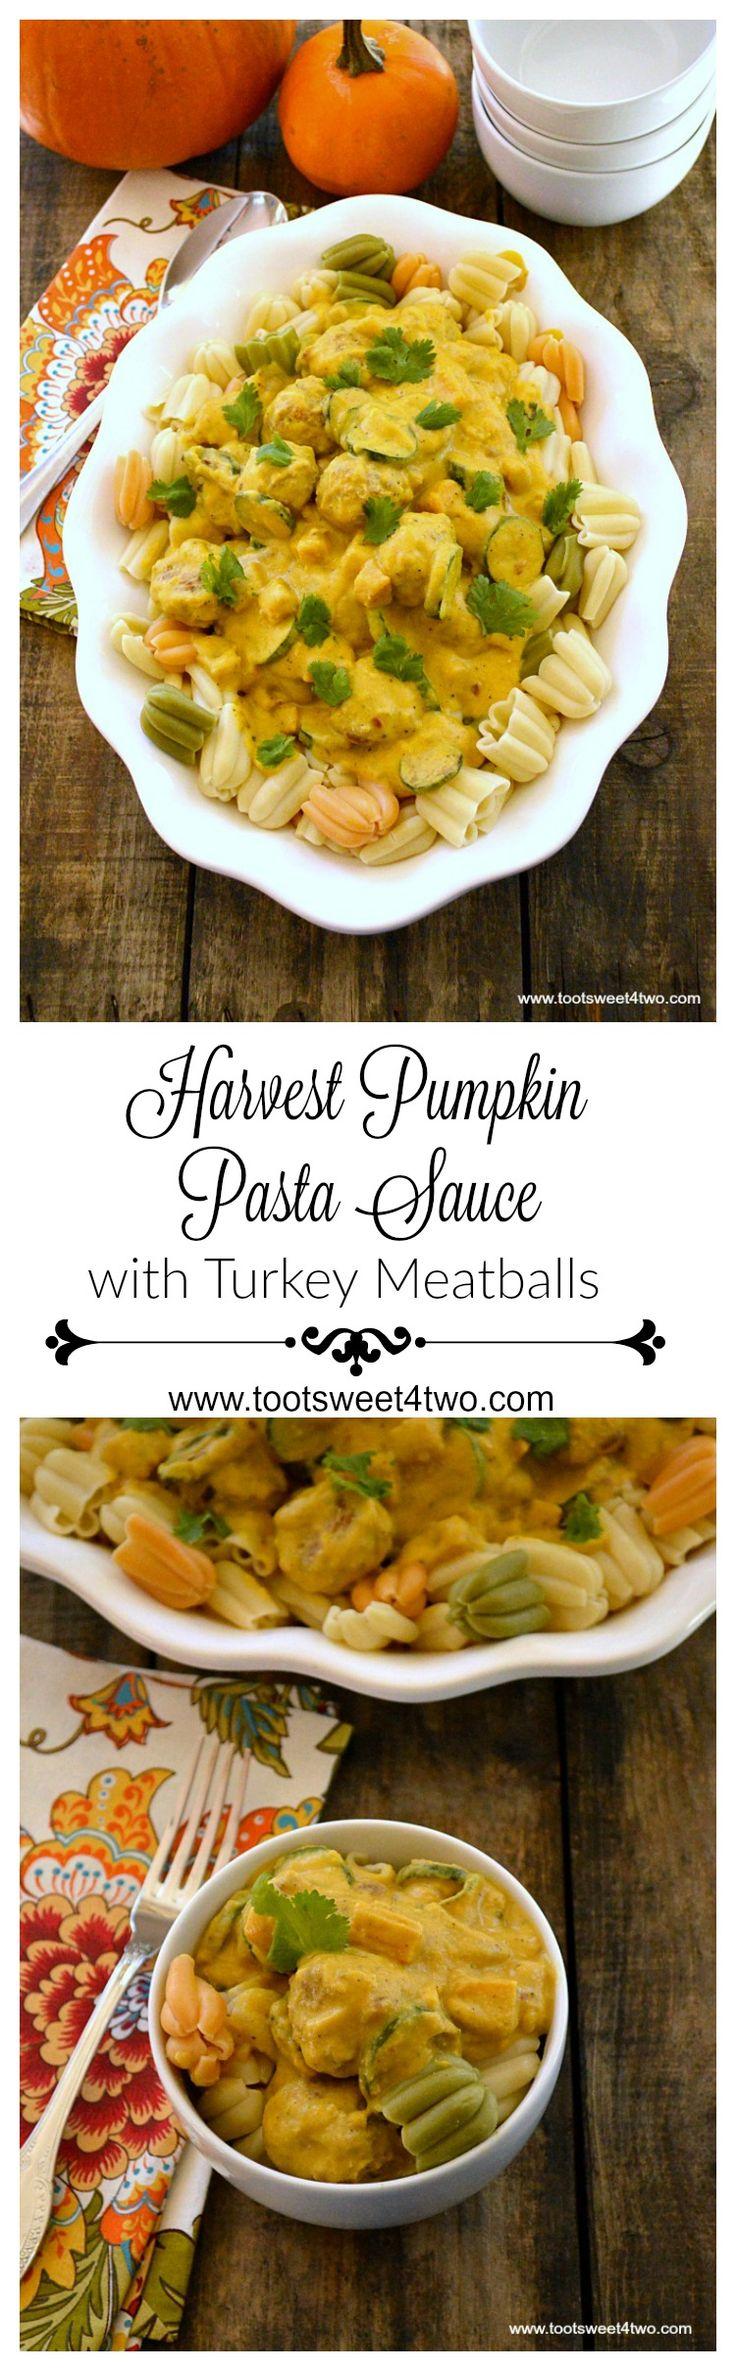 Pasta Sauce with Turkey Meatballs | Recipe | Pumpkin Pasta Sauce ...